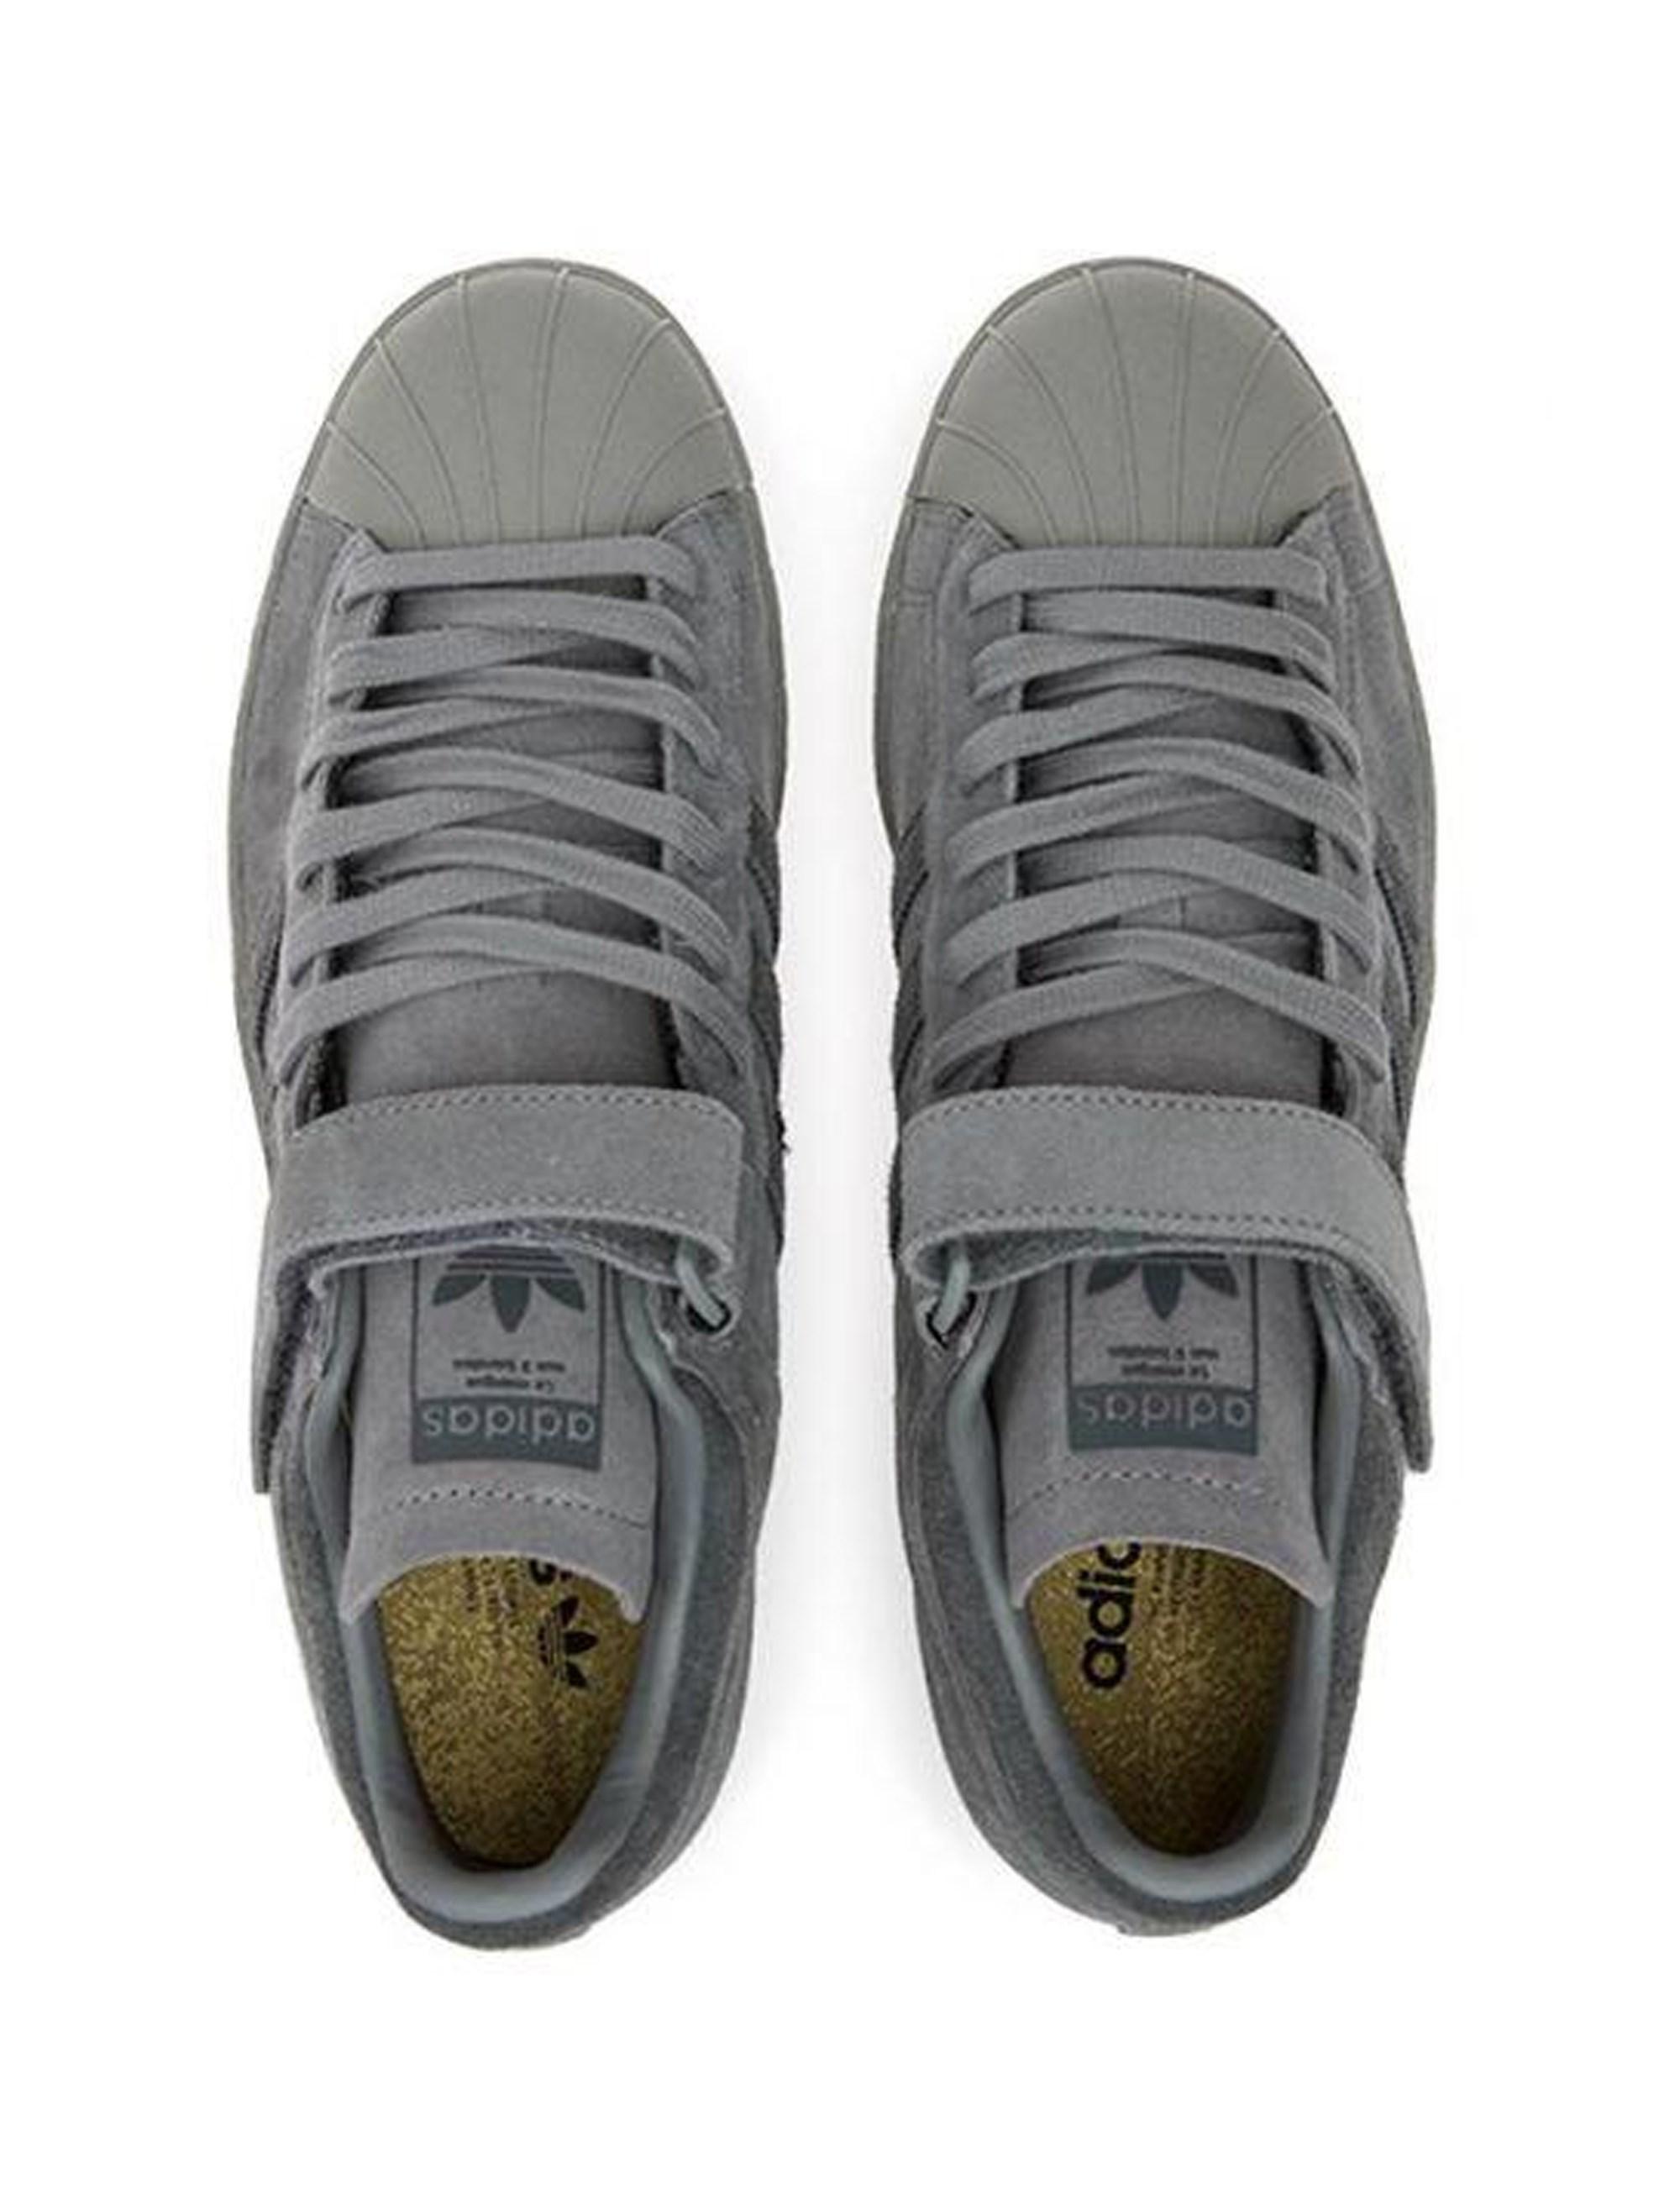 کفش مردانه آدیداس مدل Pro Shell 80s